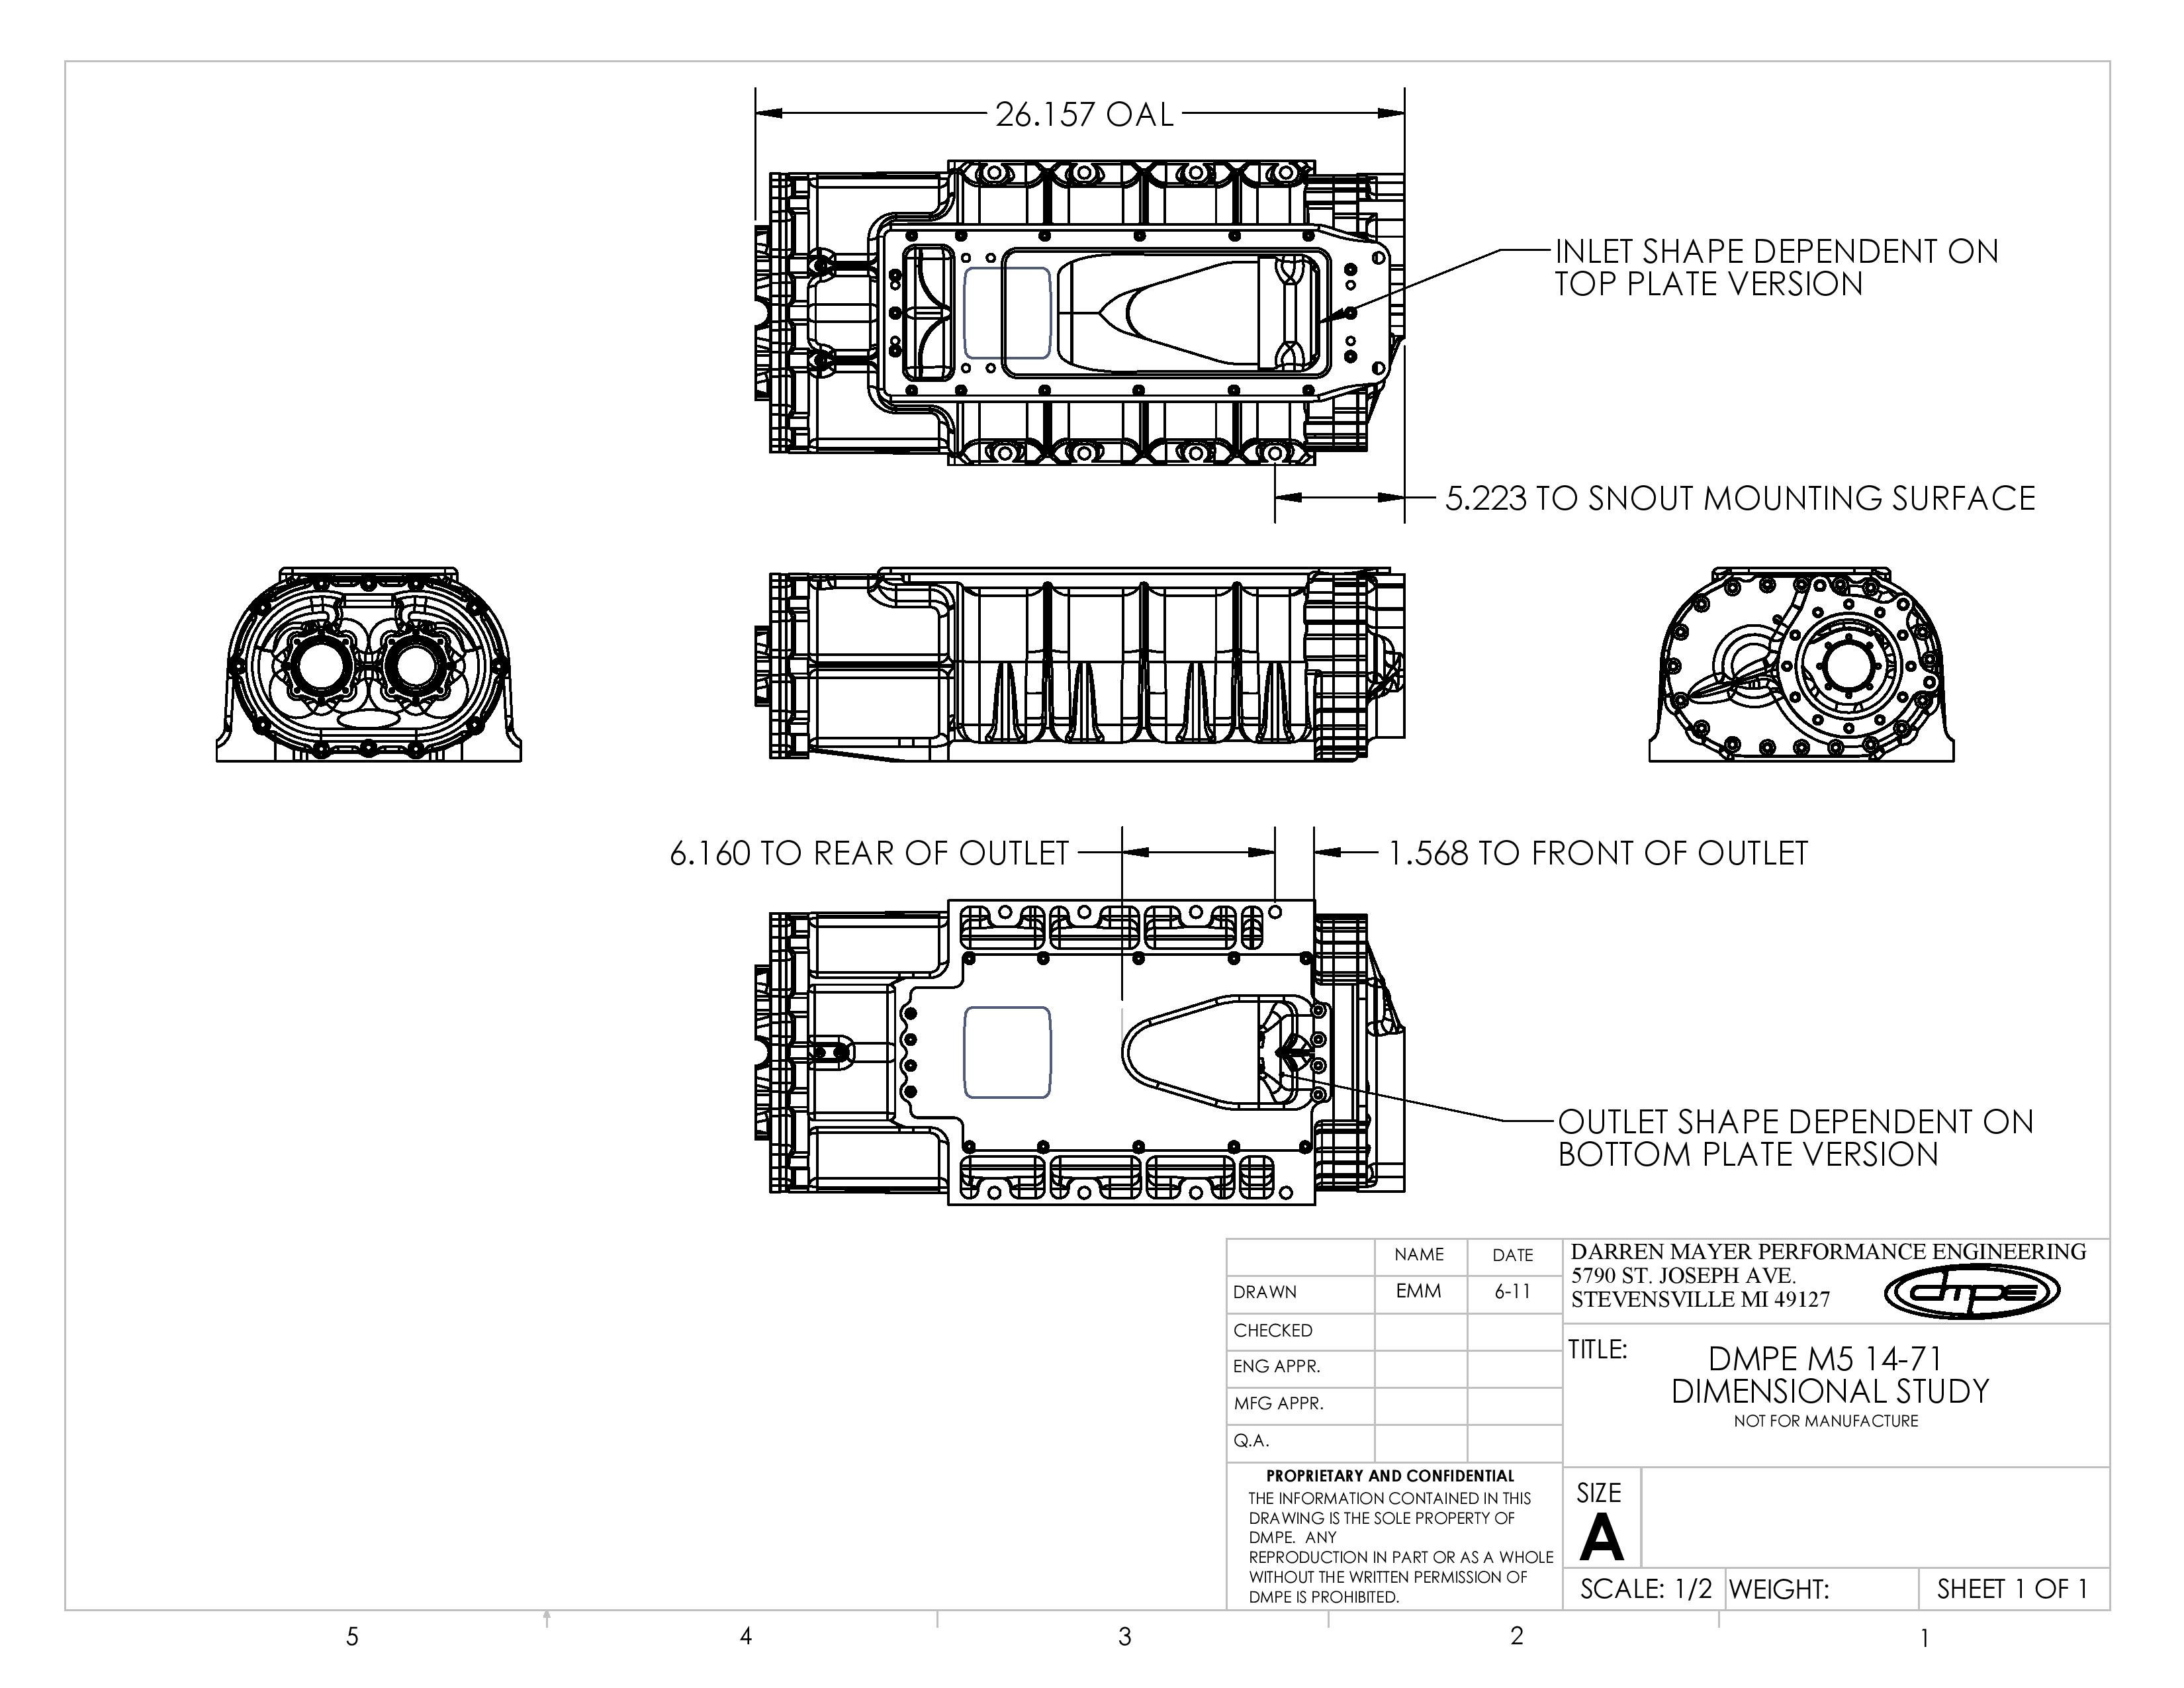 m5-14-71-basic-dimensional-info-page-001.jpg